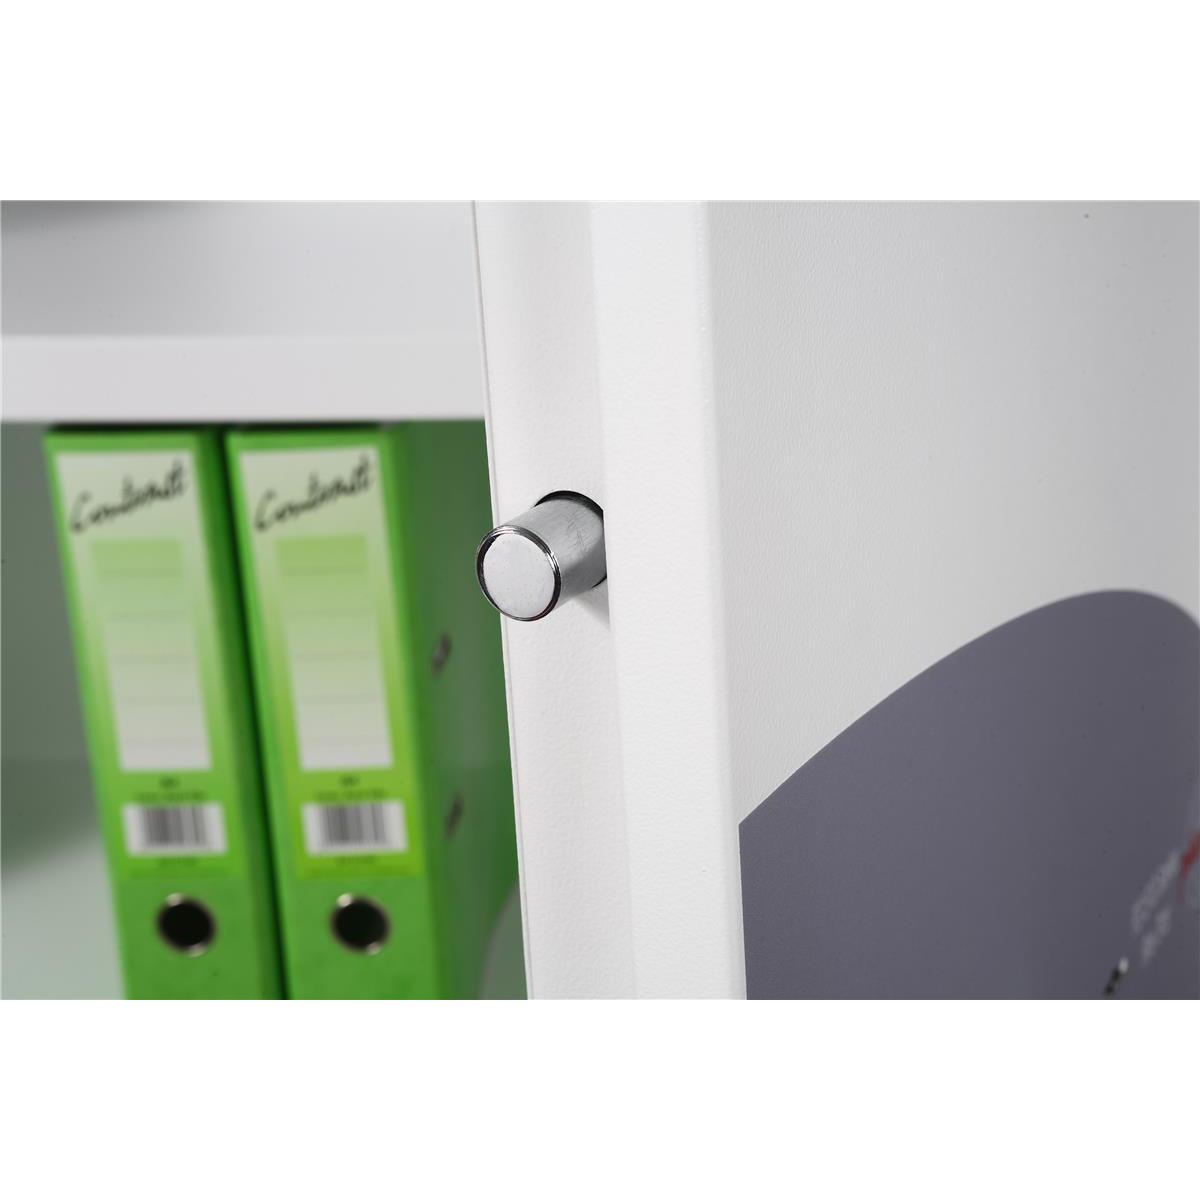 Phoenix Fire Ranger Steel Storage Cupboard Fire and Burglary Resistant W930xD520x1950mm Ref FS1513K